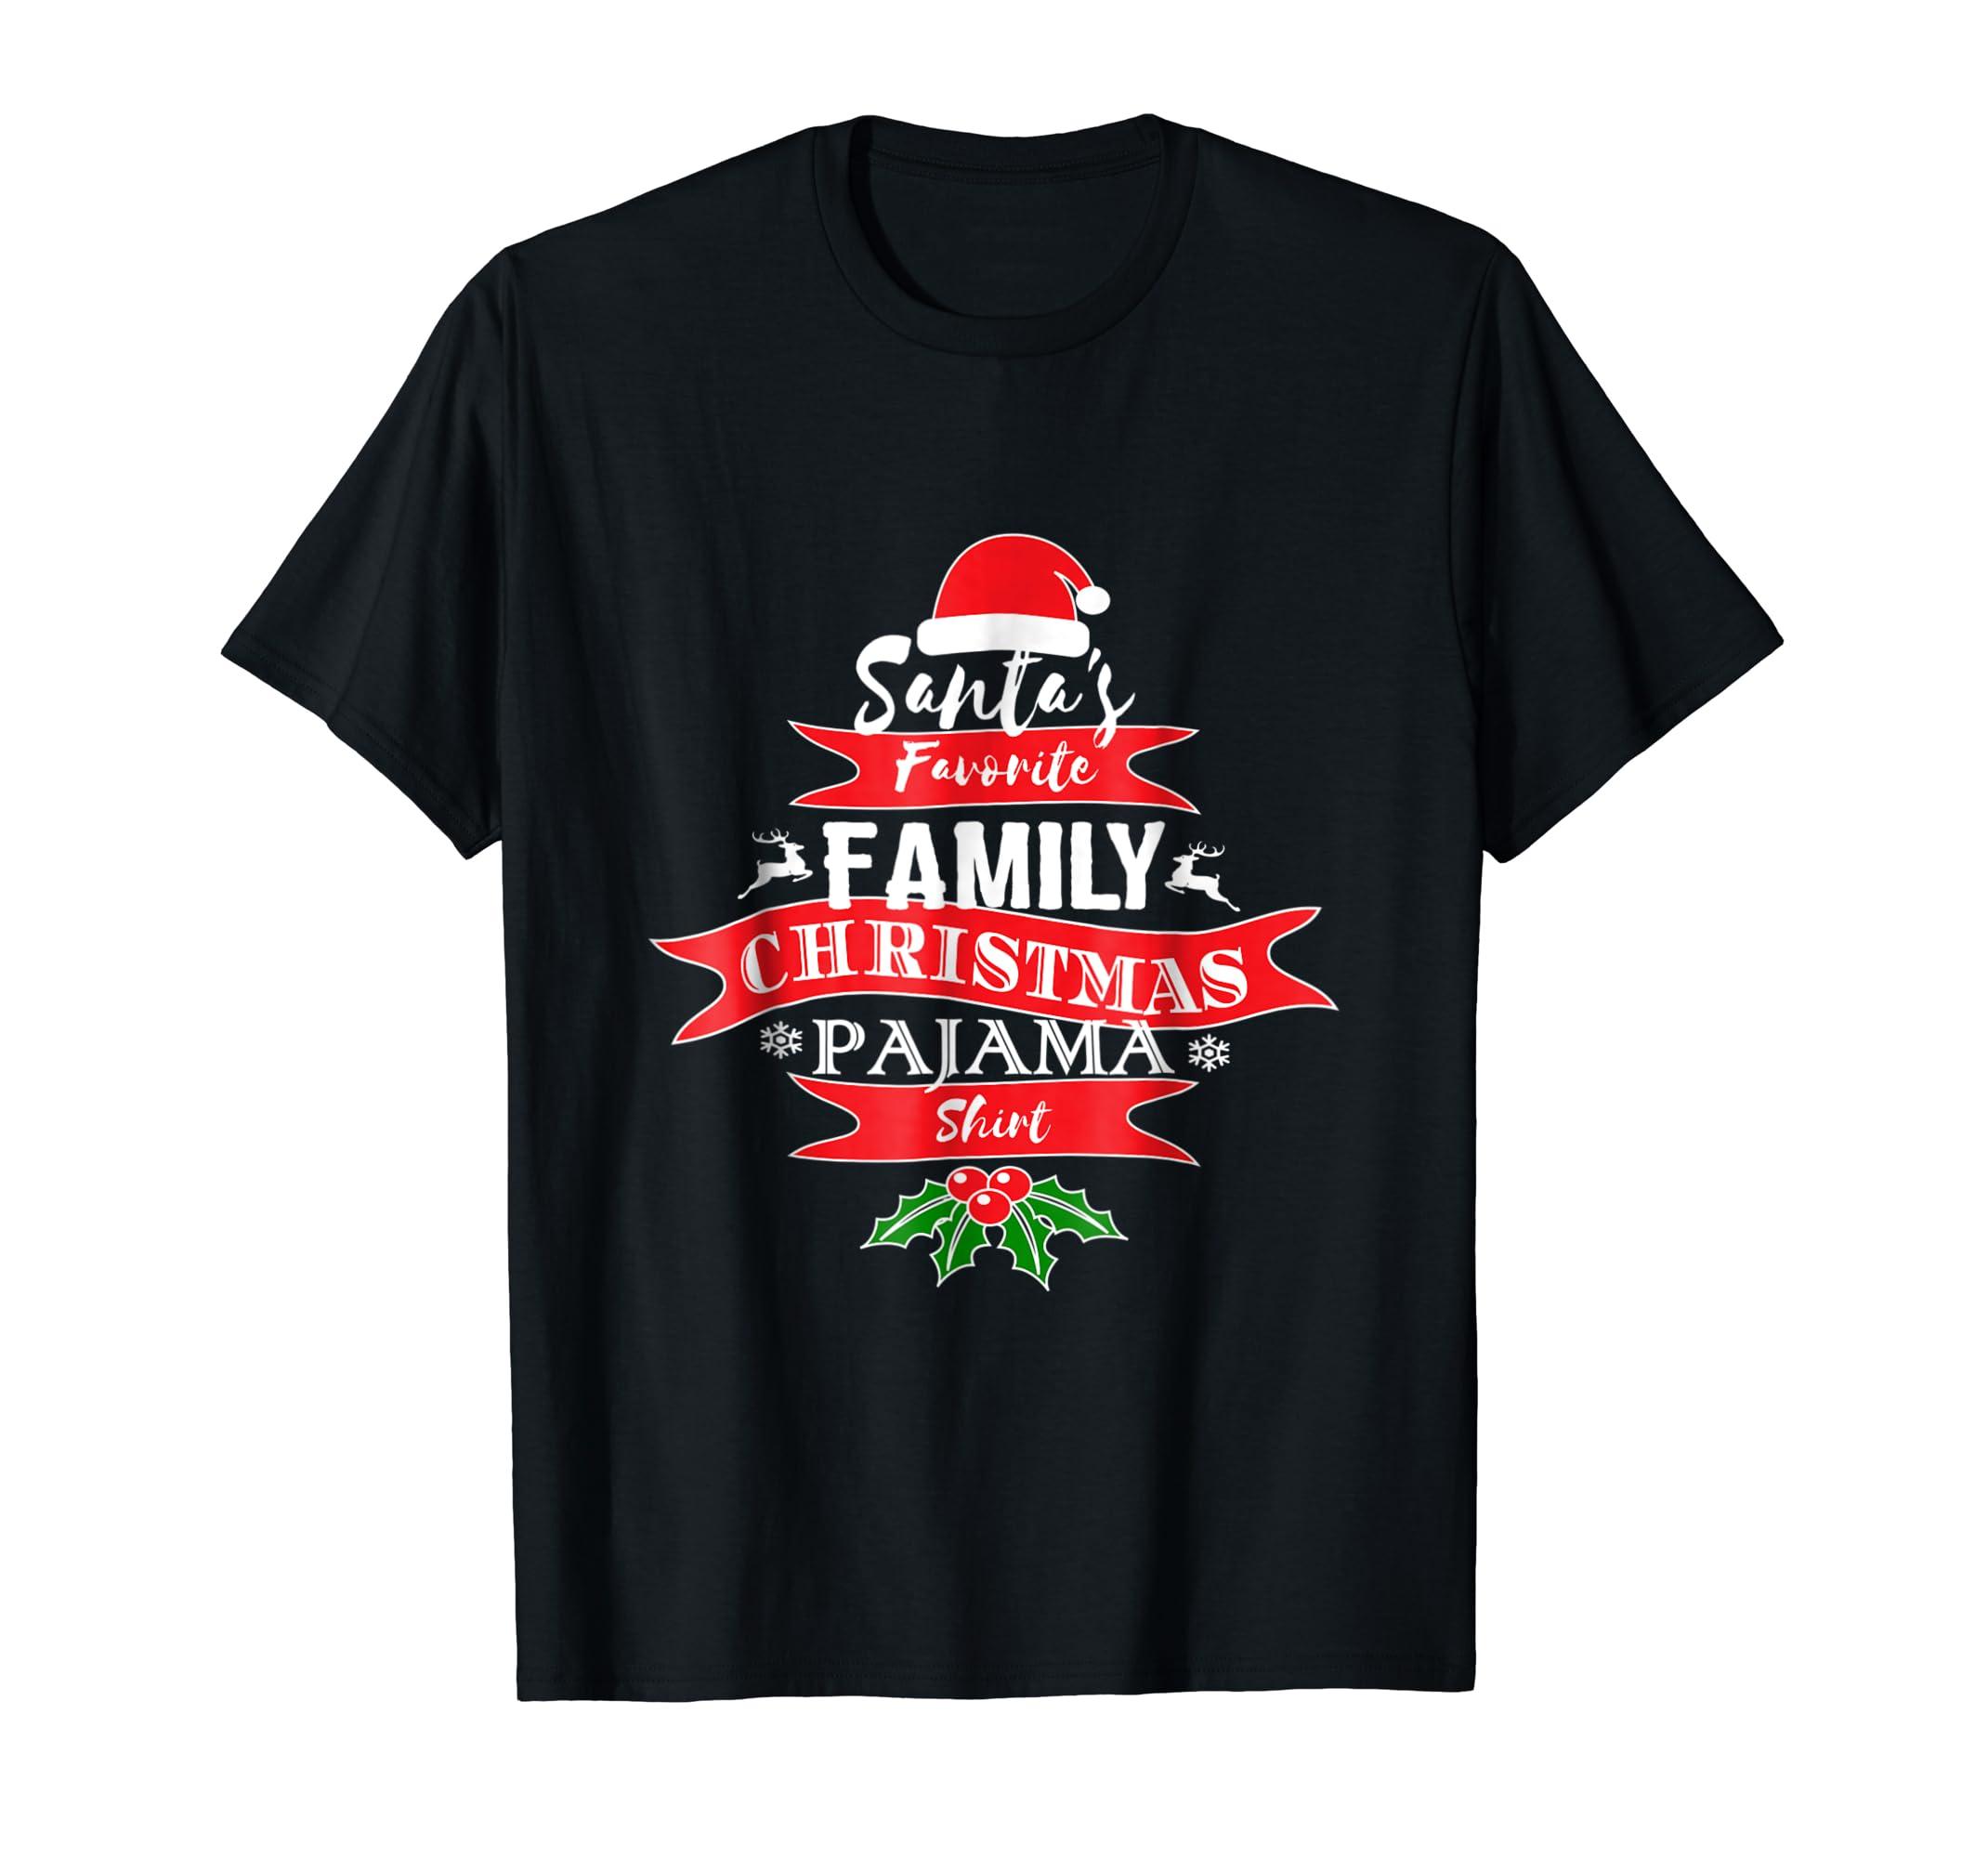 783e5ea956 Amazon.com  Funny Christmas Pajama for Family Short Sleeve Xmas Shirt   Clothing